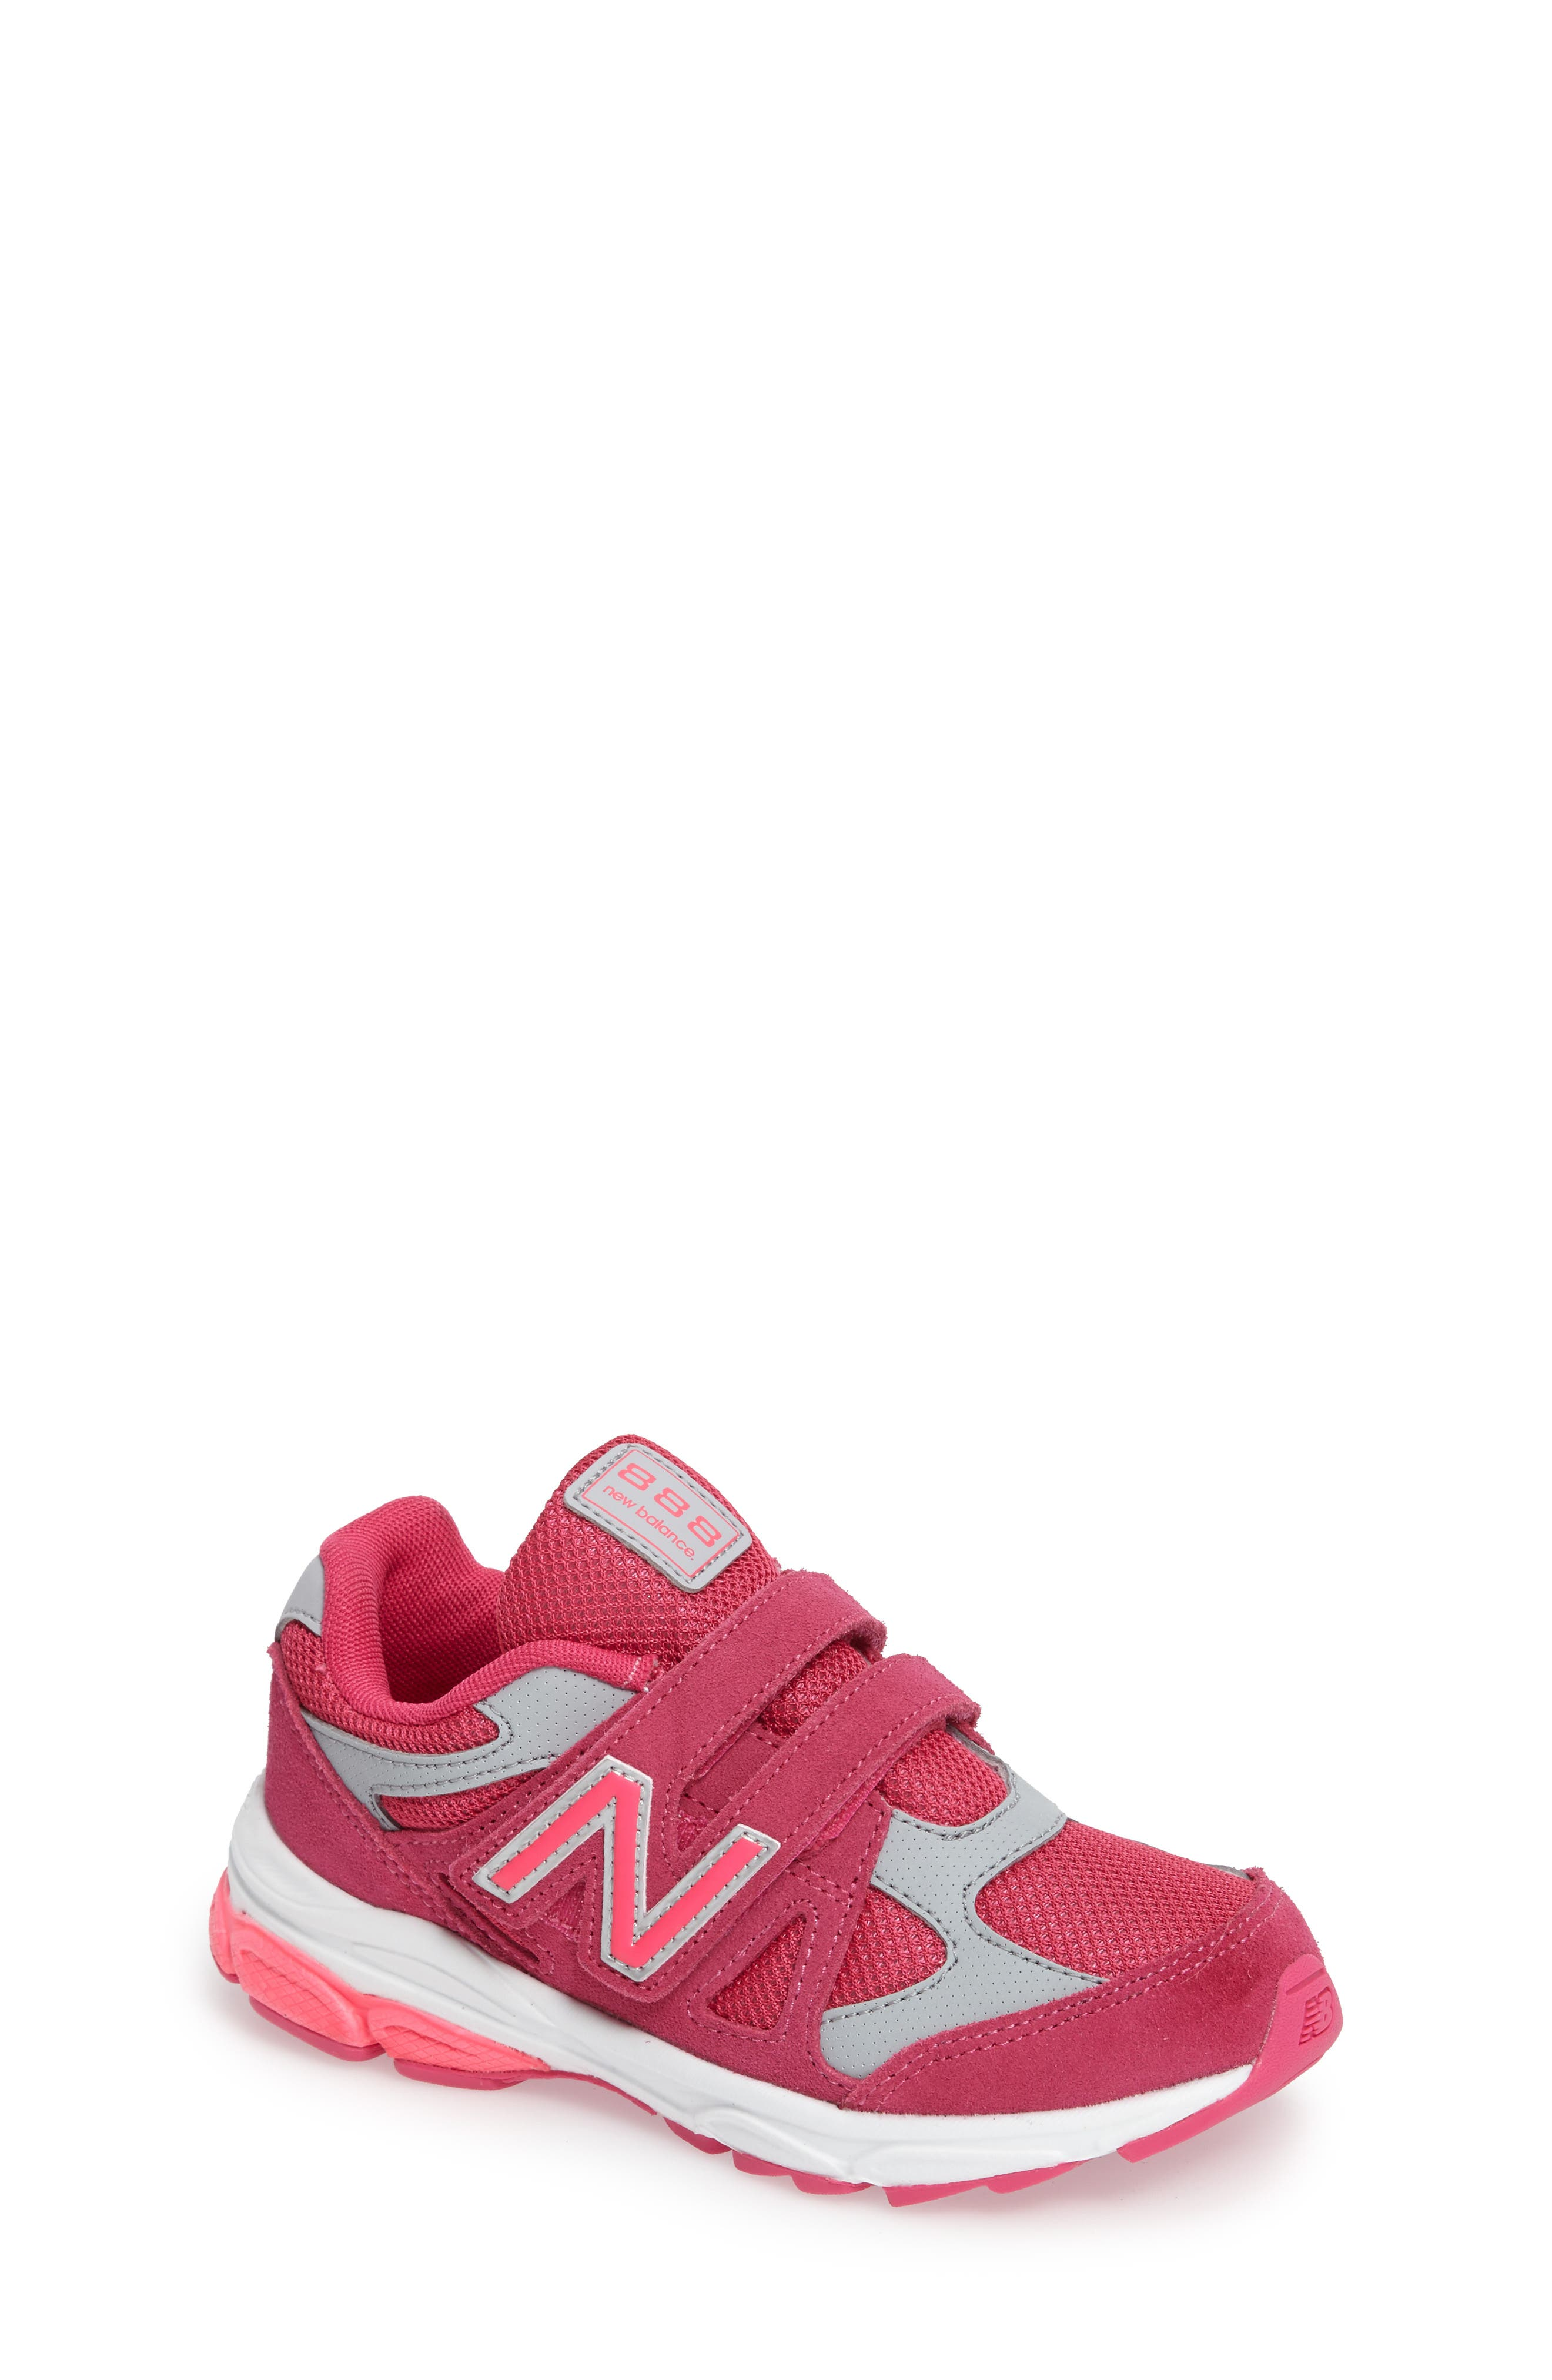 888 Sneaker,                             Main thumbnail 1, color,                             664